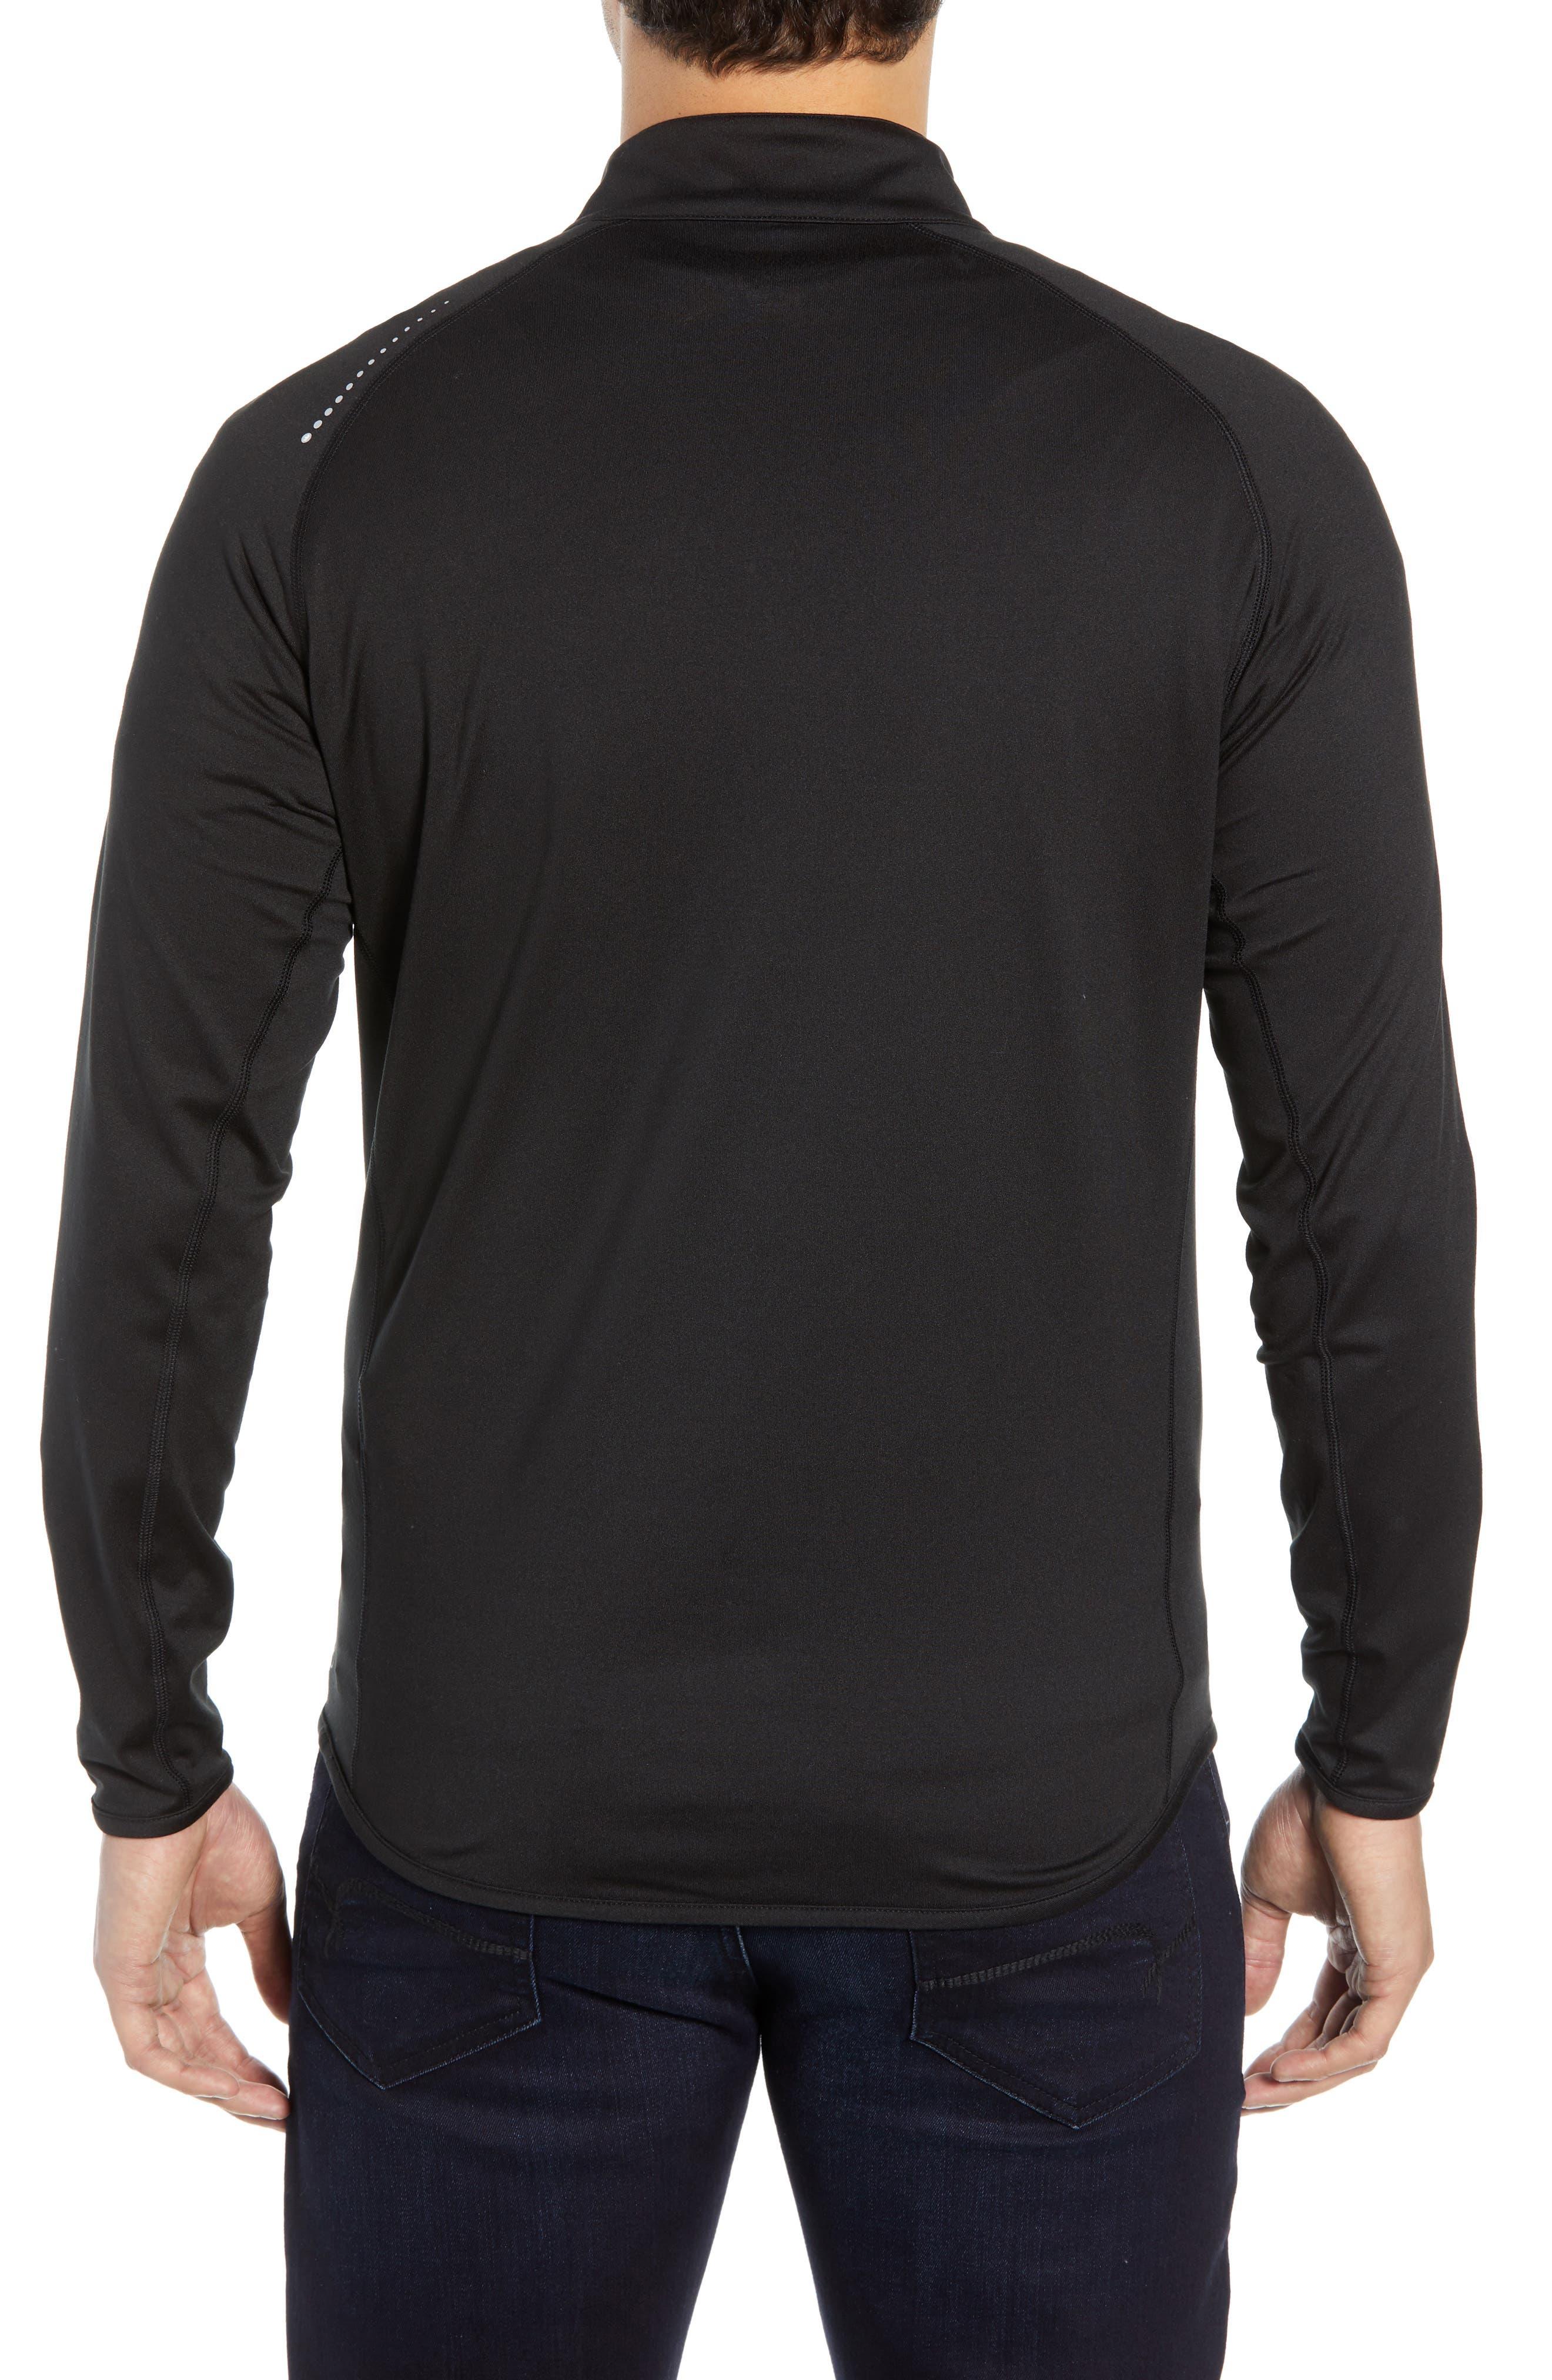 PETER MILLAR, Sydney Quarter Zip Tech Pullover, Alternate thumbnail 2, color, BLACK